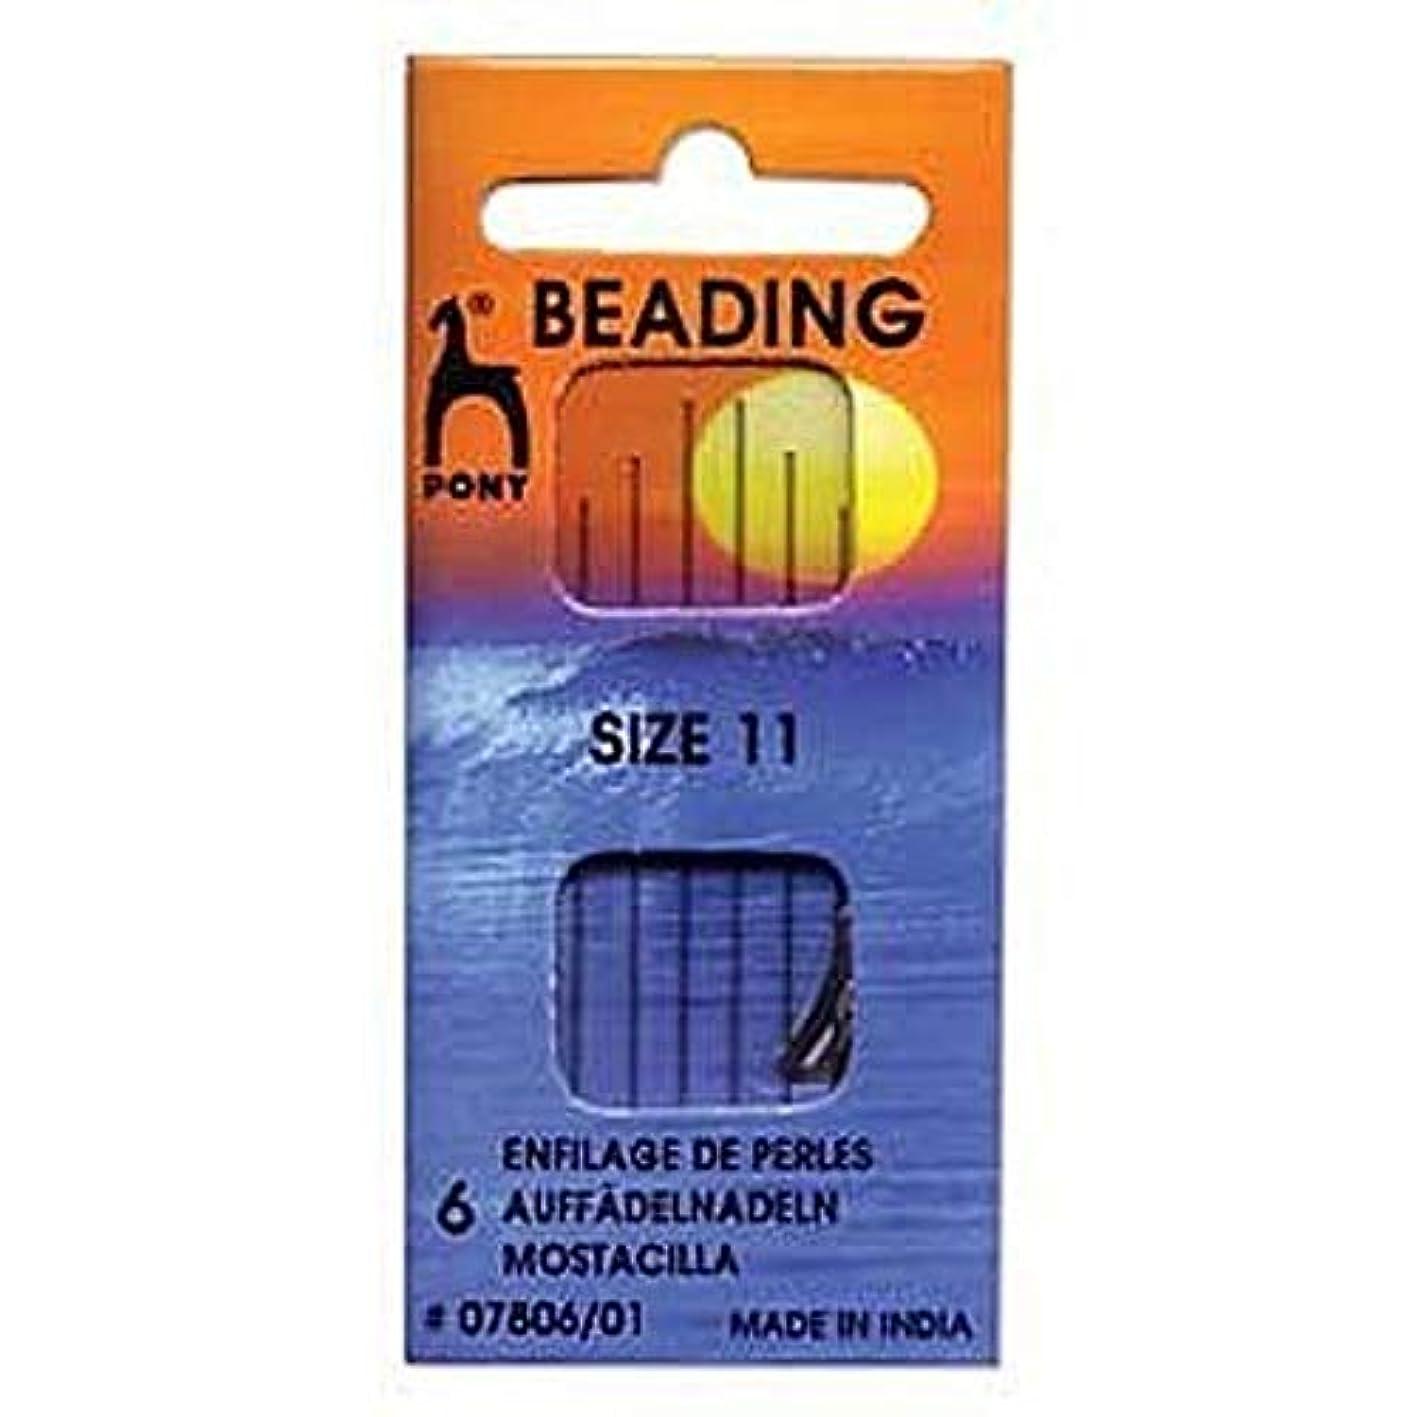 Pony Beading Needles -Size 11 ytqhgpgwqkx765